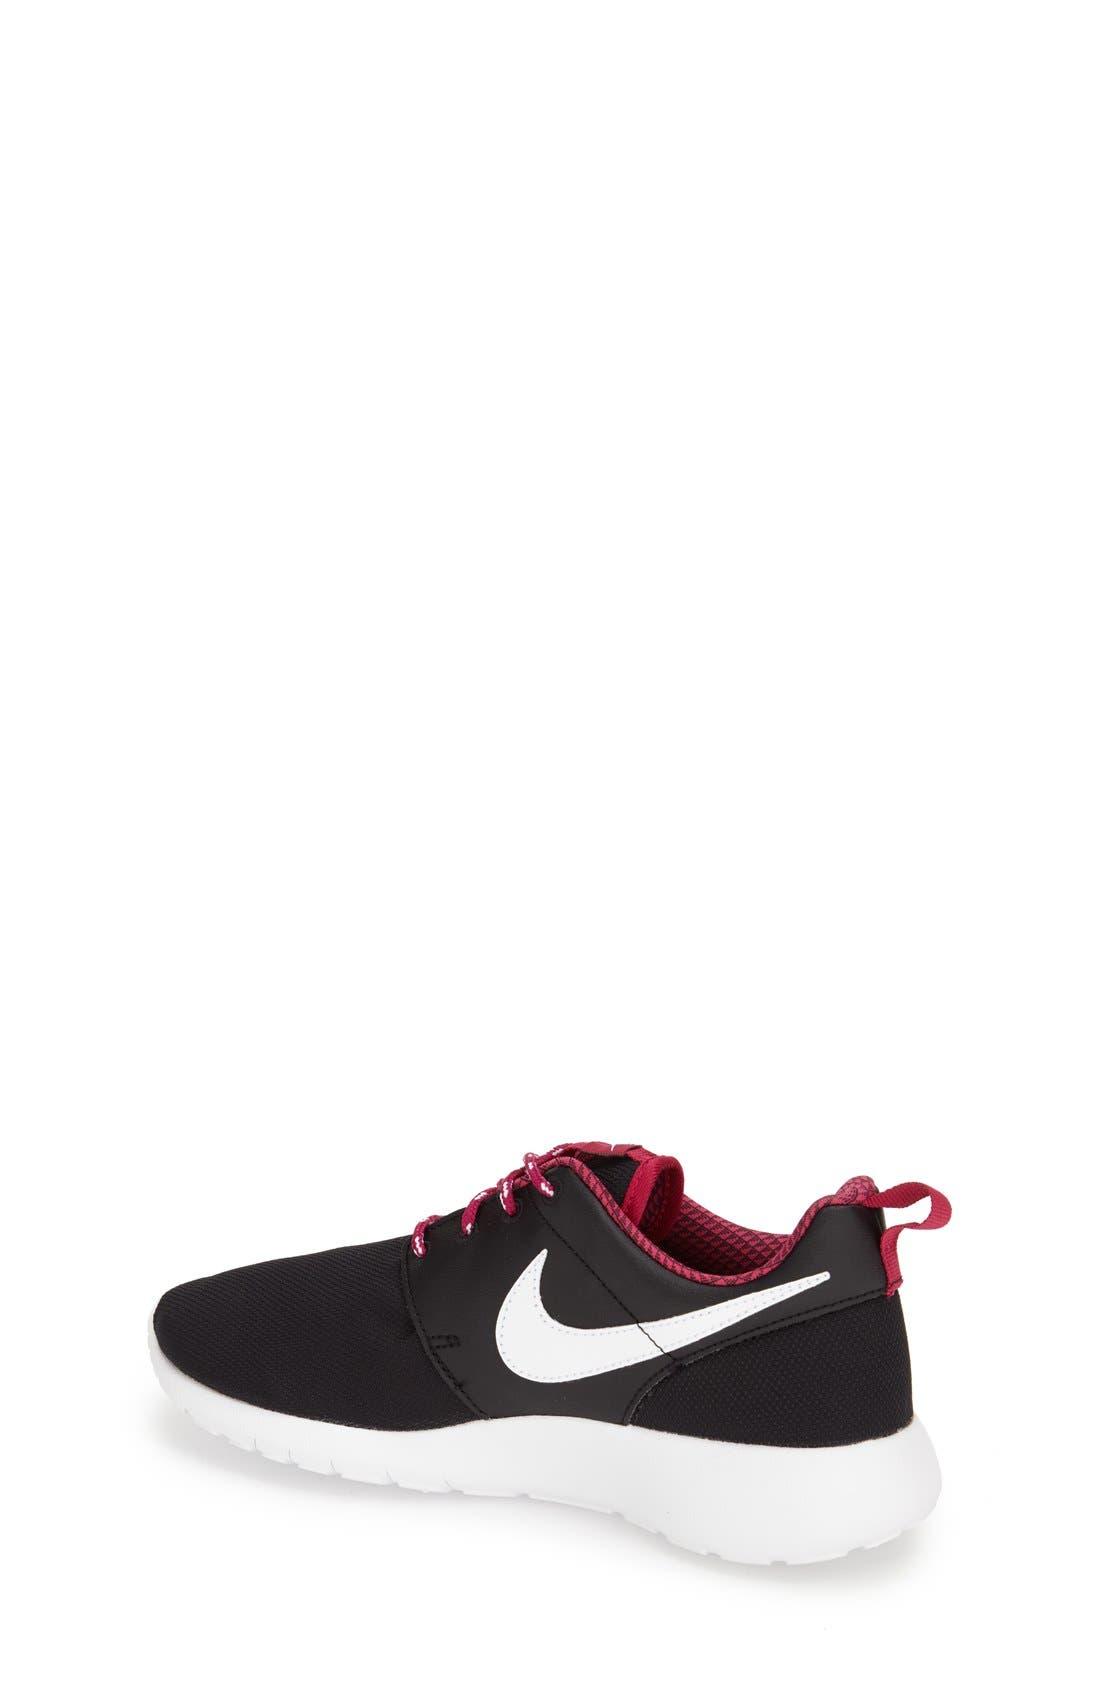 'Roshe Run' Athletic Shoe,                             Alternate thumbnail 119, color,